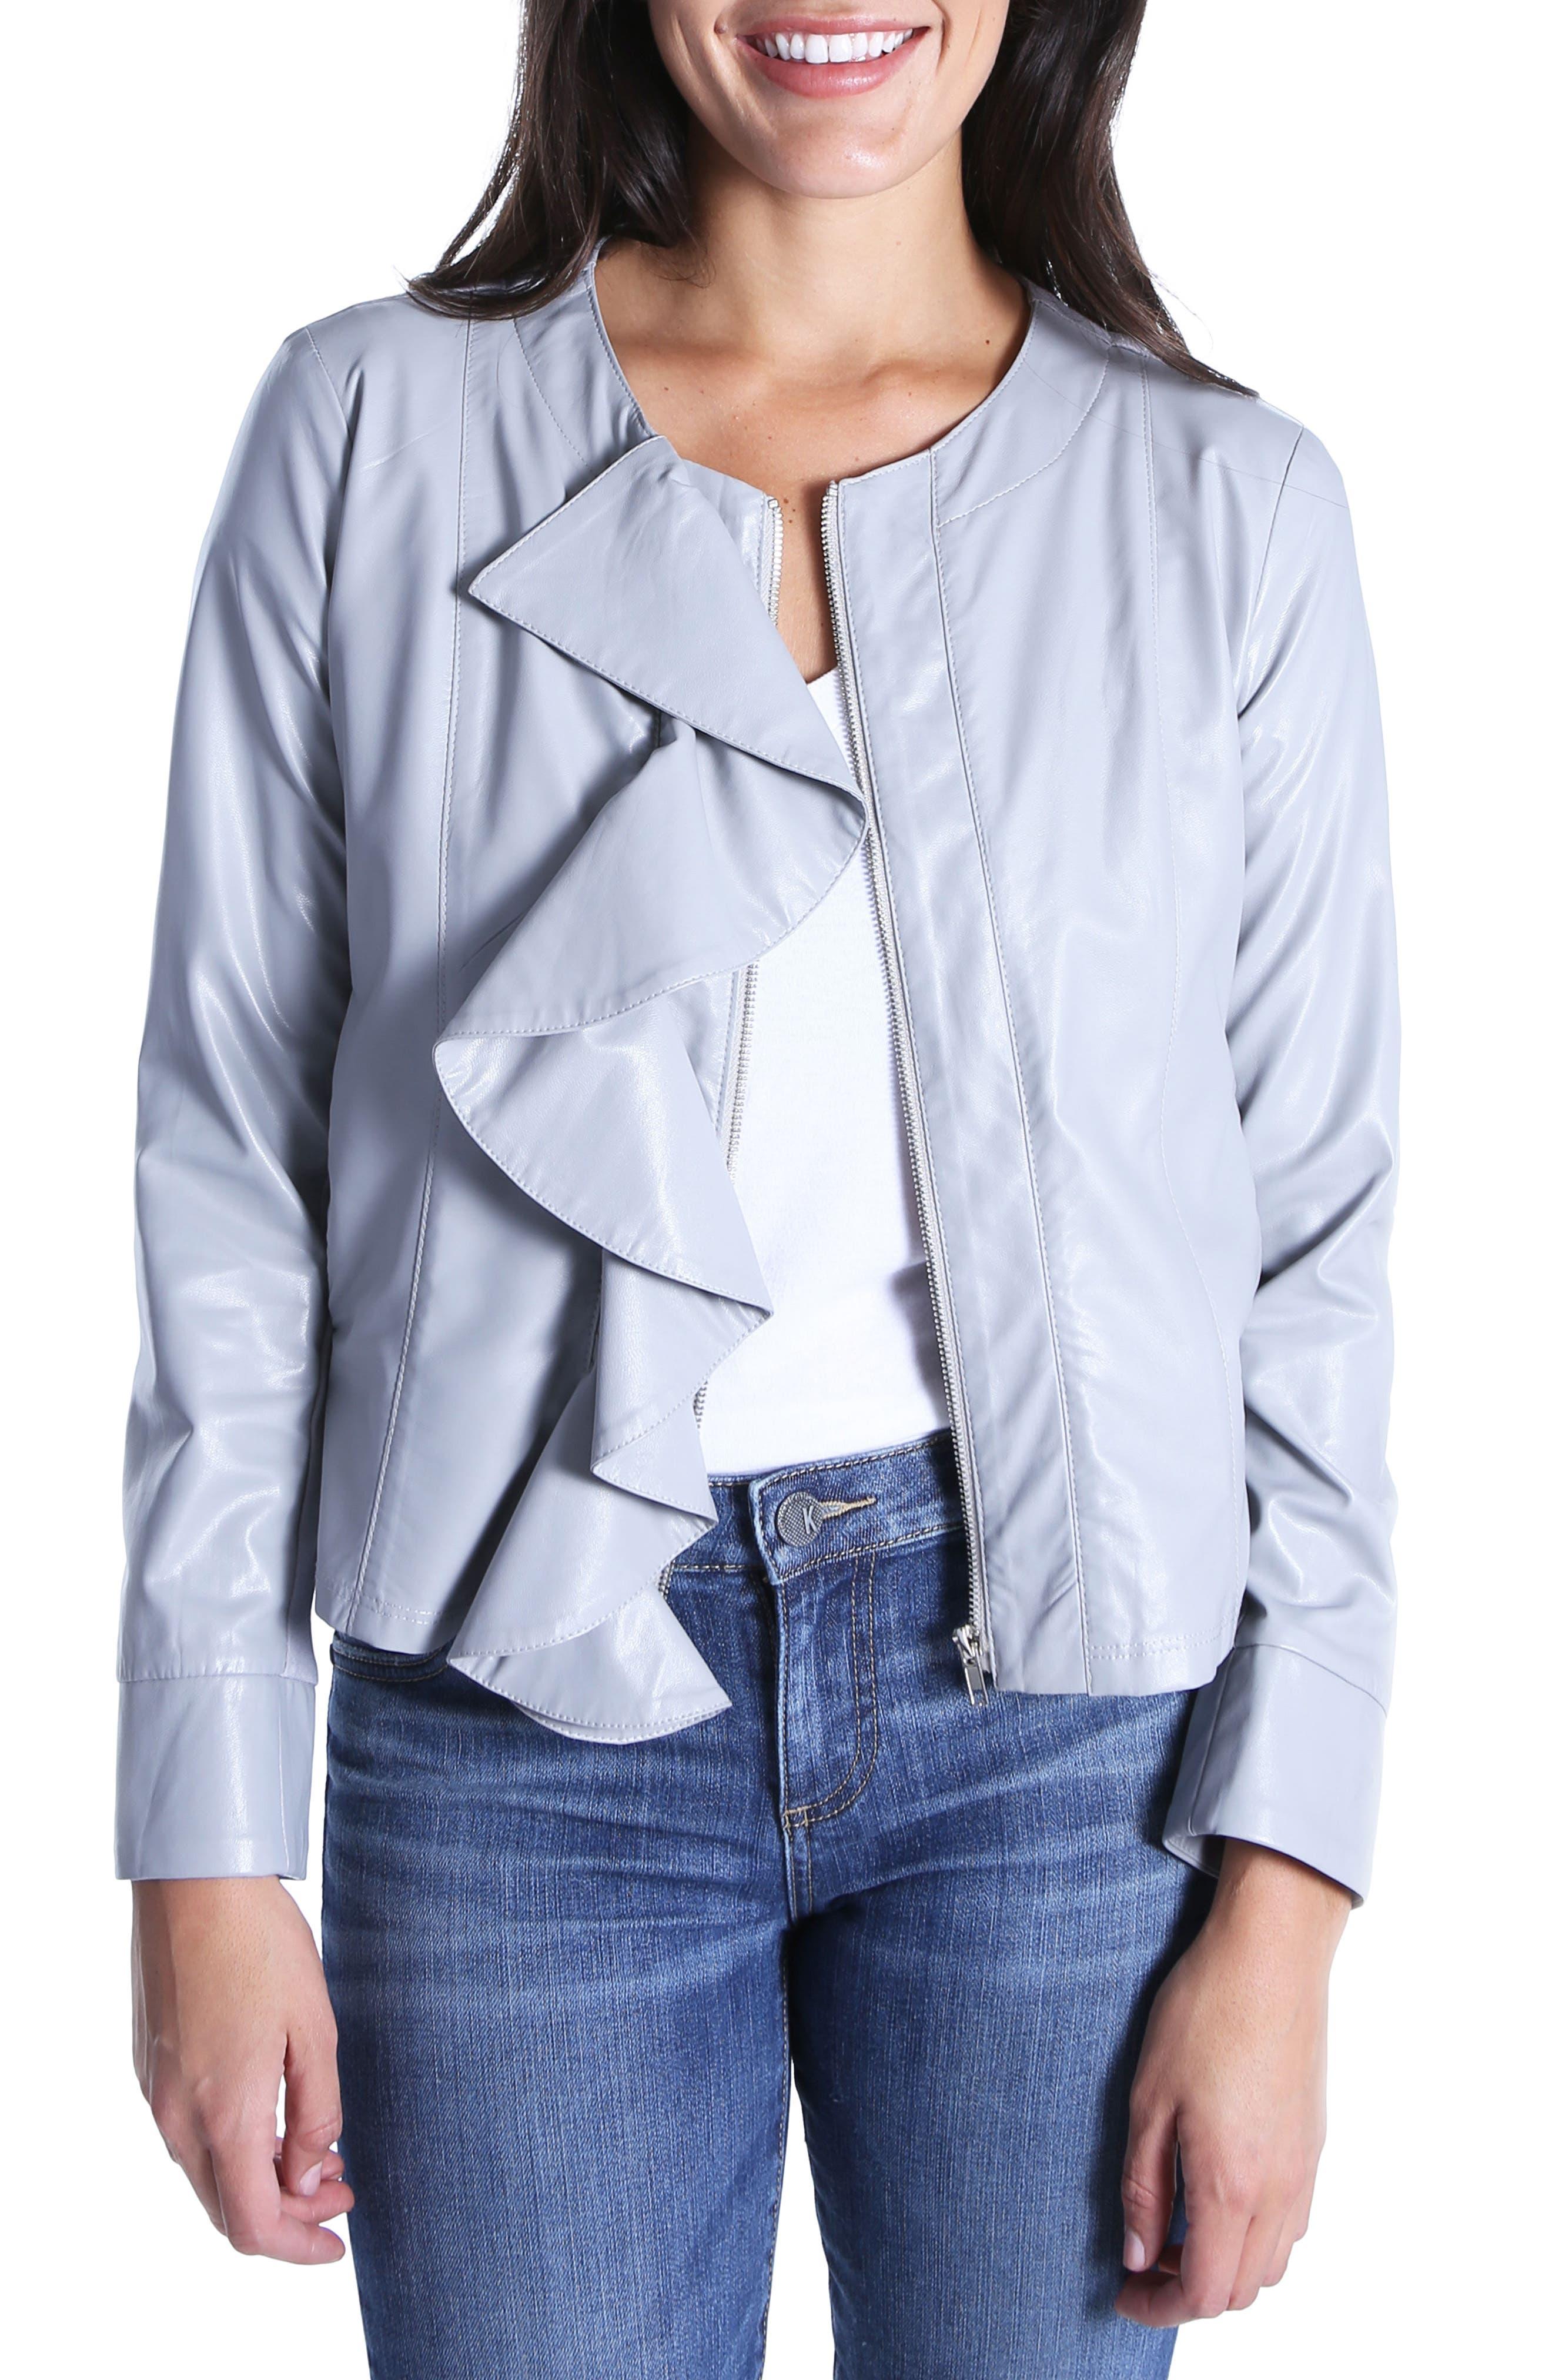 Dahliana Faux Leather Jacket,                             Main thumbnail 1, color,                             Grey